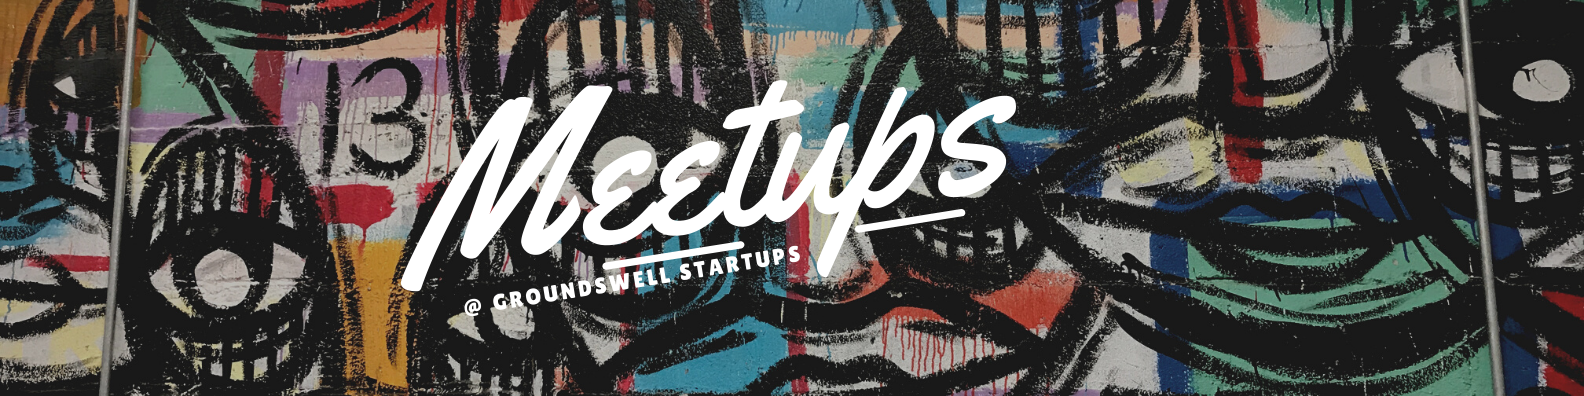 Groundswell Startups Meetups Melbourne FL